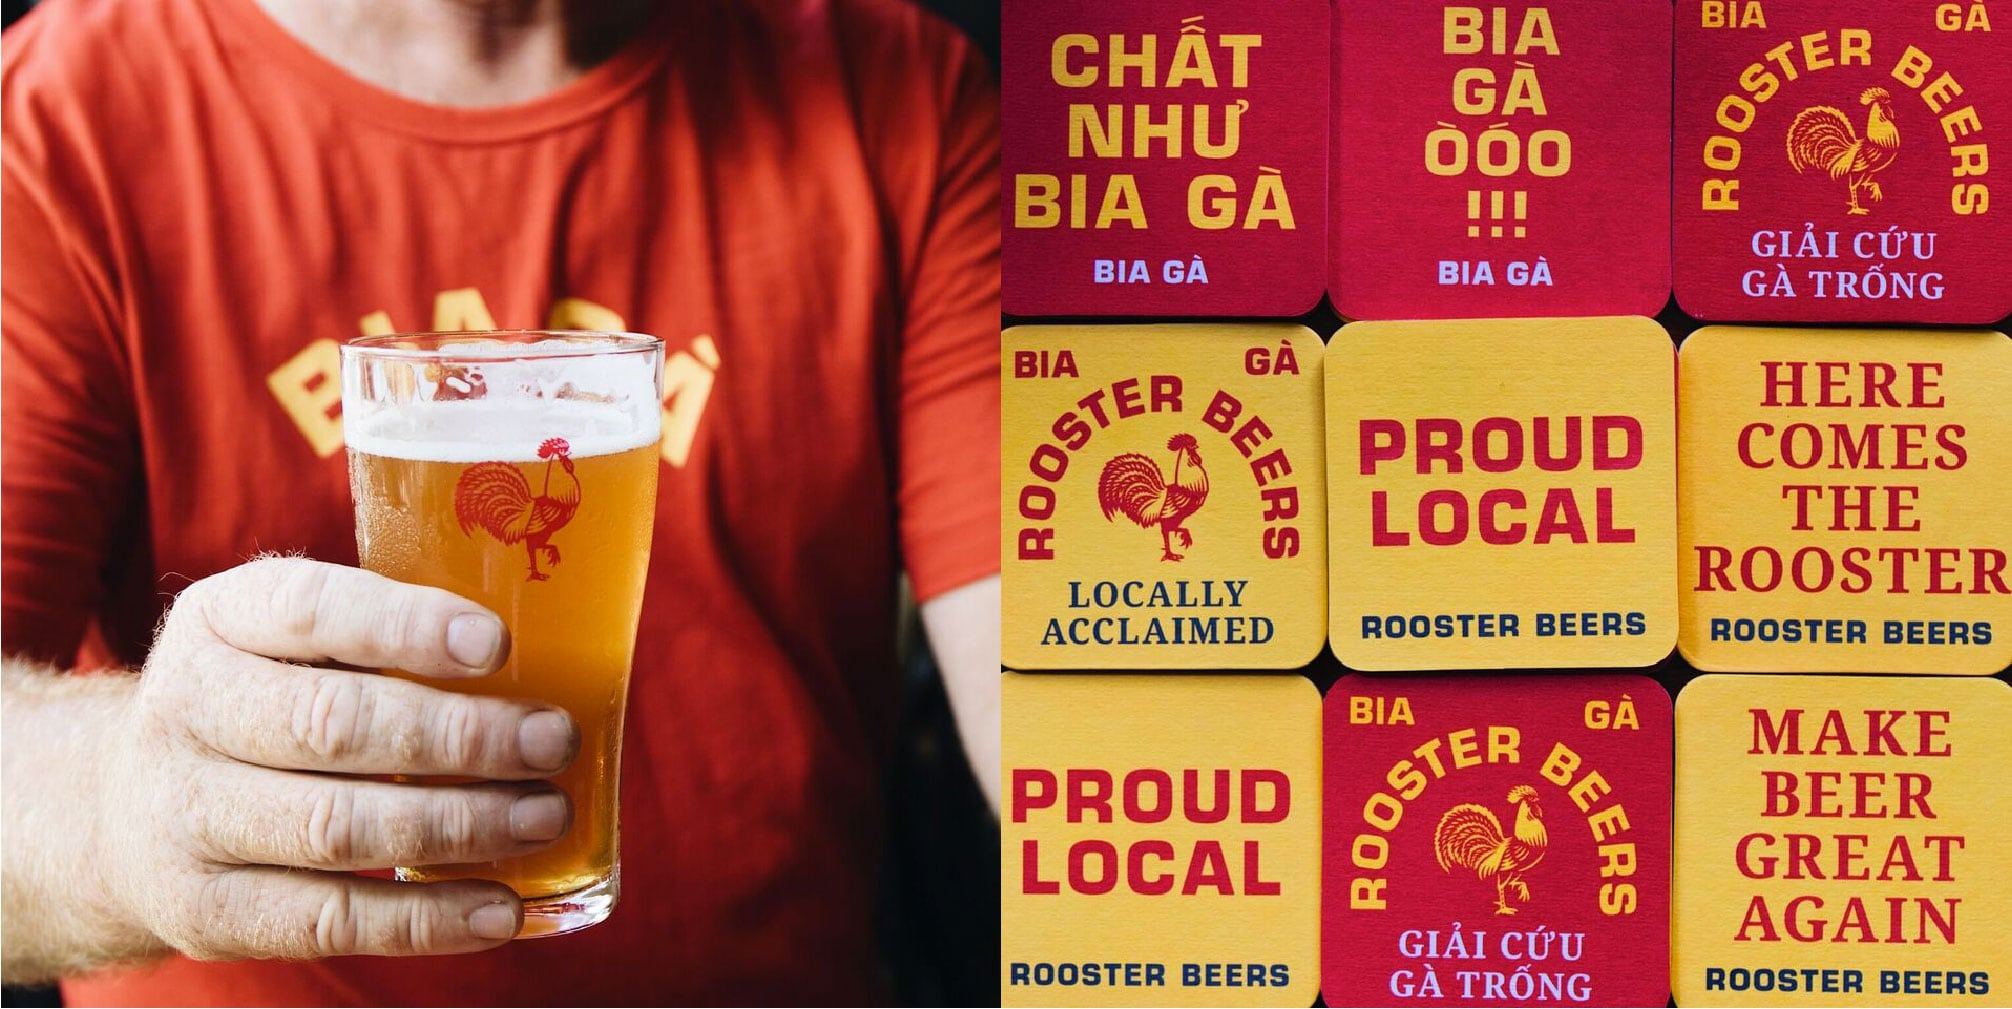 Rooster Beers' Rebranding: The Anti-Craft Vietnam Craft Beer Brand